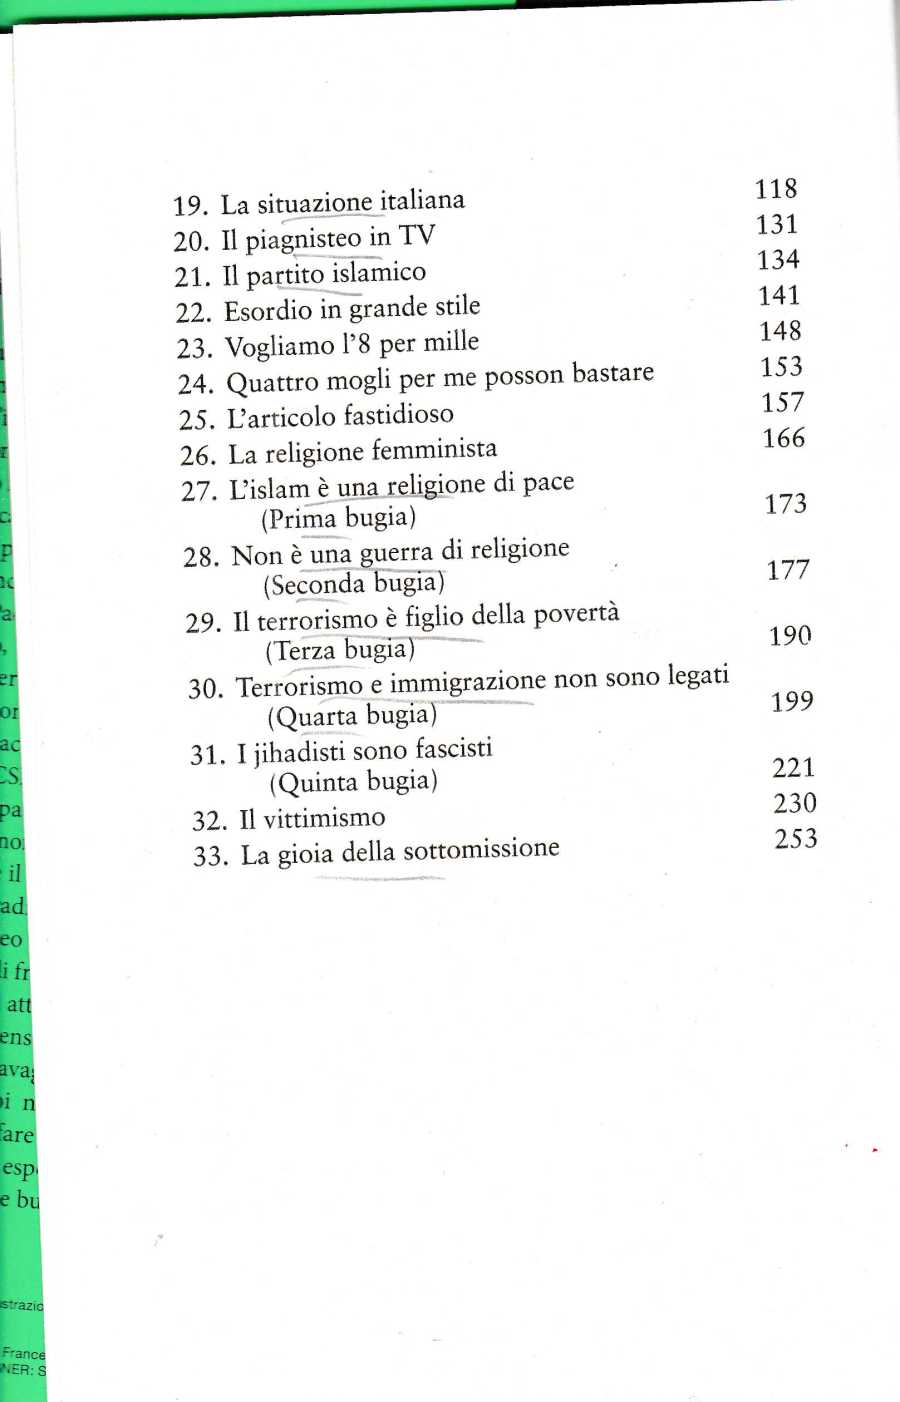 ISLAMOFOLLIA2515